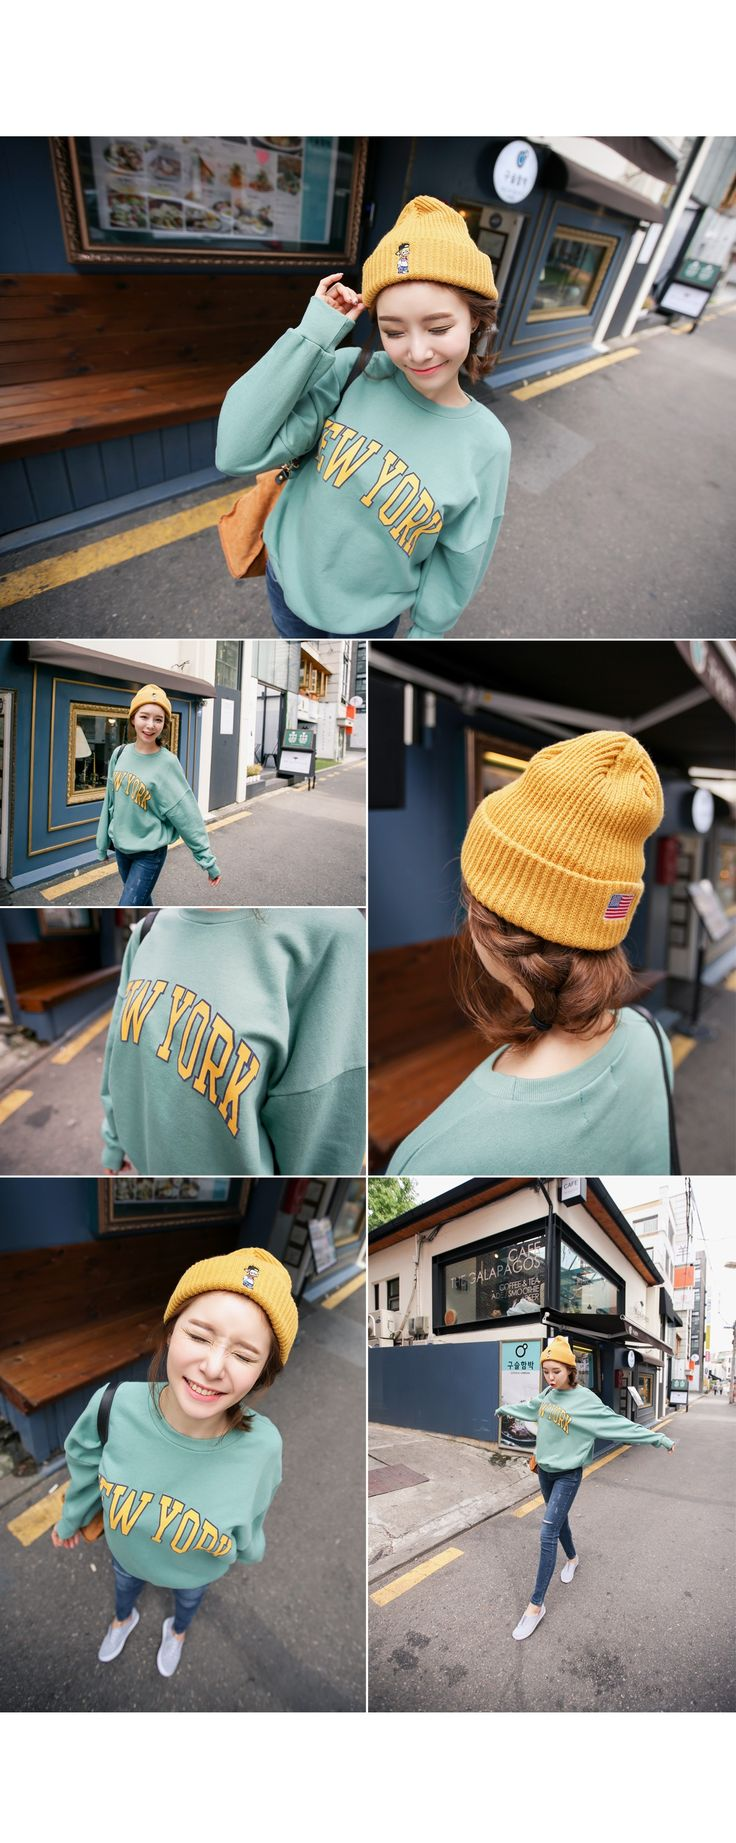 Korean [Qnigirls] Letter printed sweatshirt「koreabuys.com」